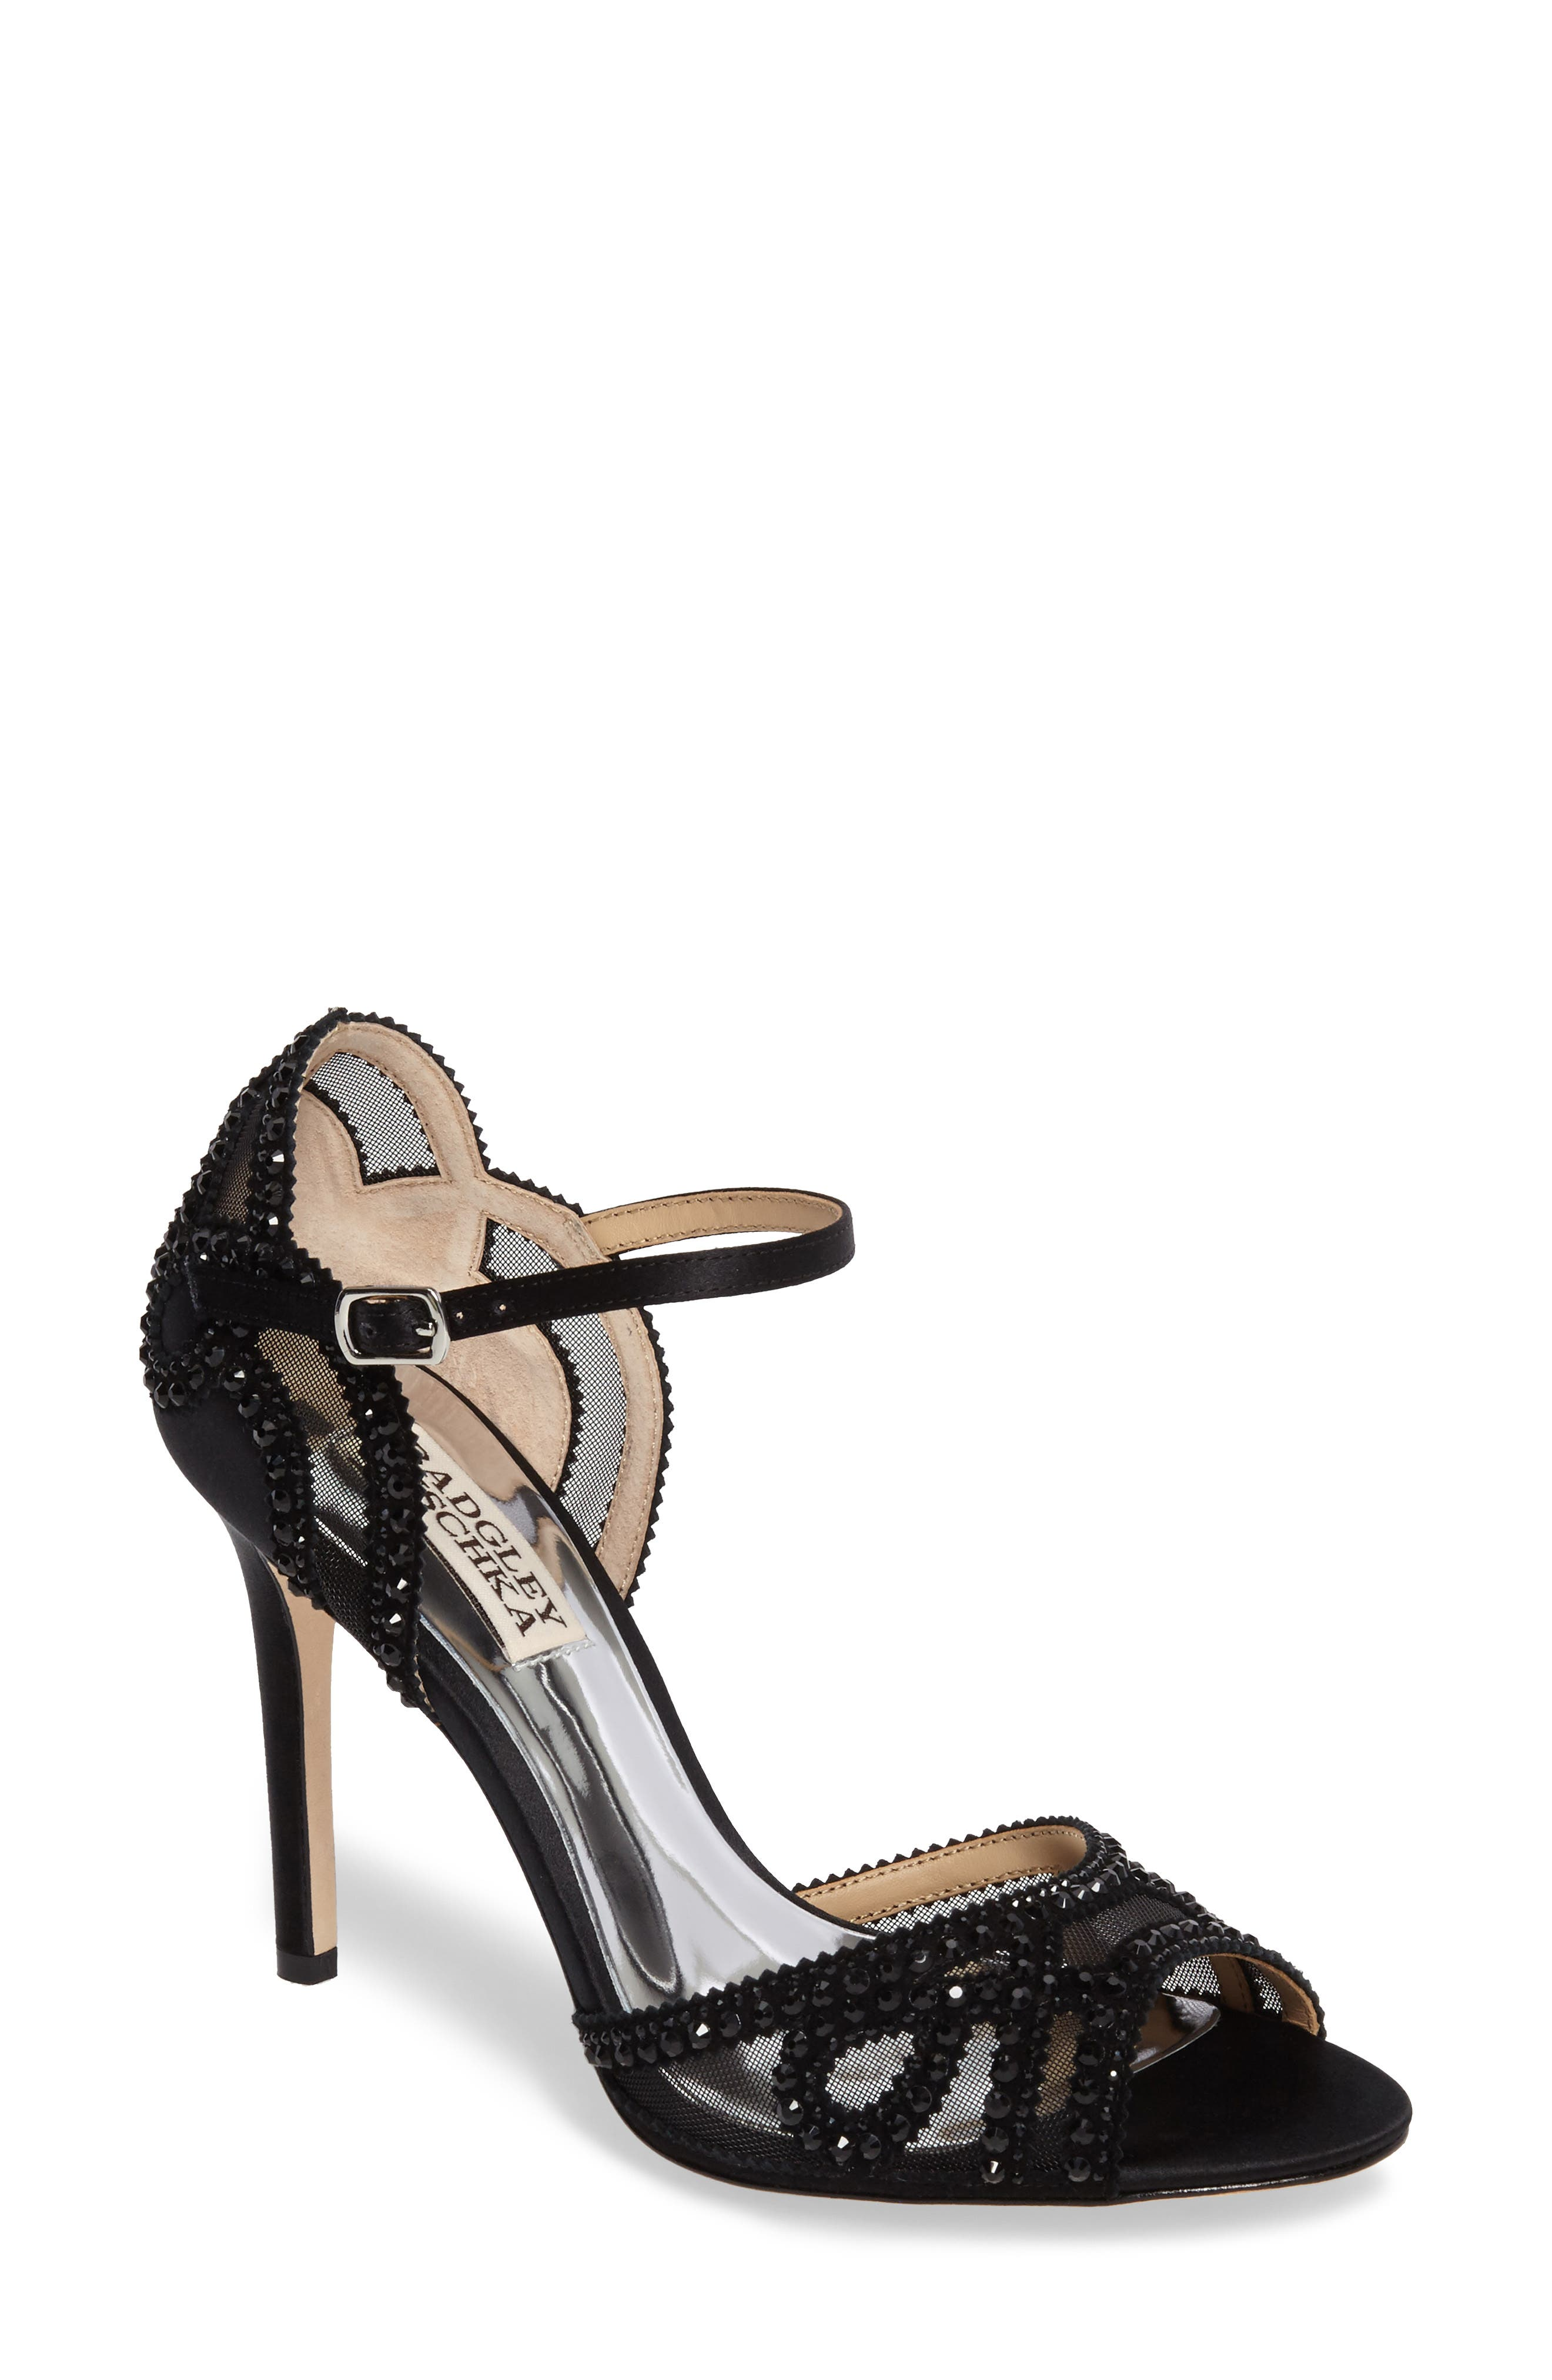 Image of Badgley Mischka Embellished Mesh Stiletto Heel Sandal